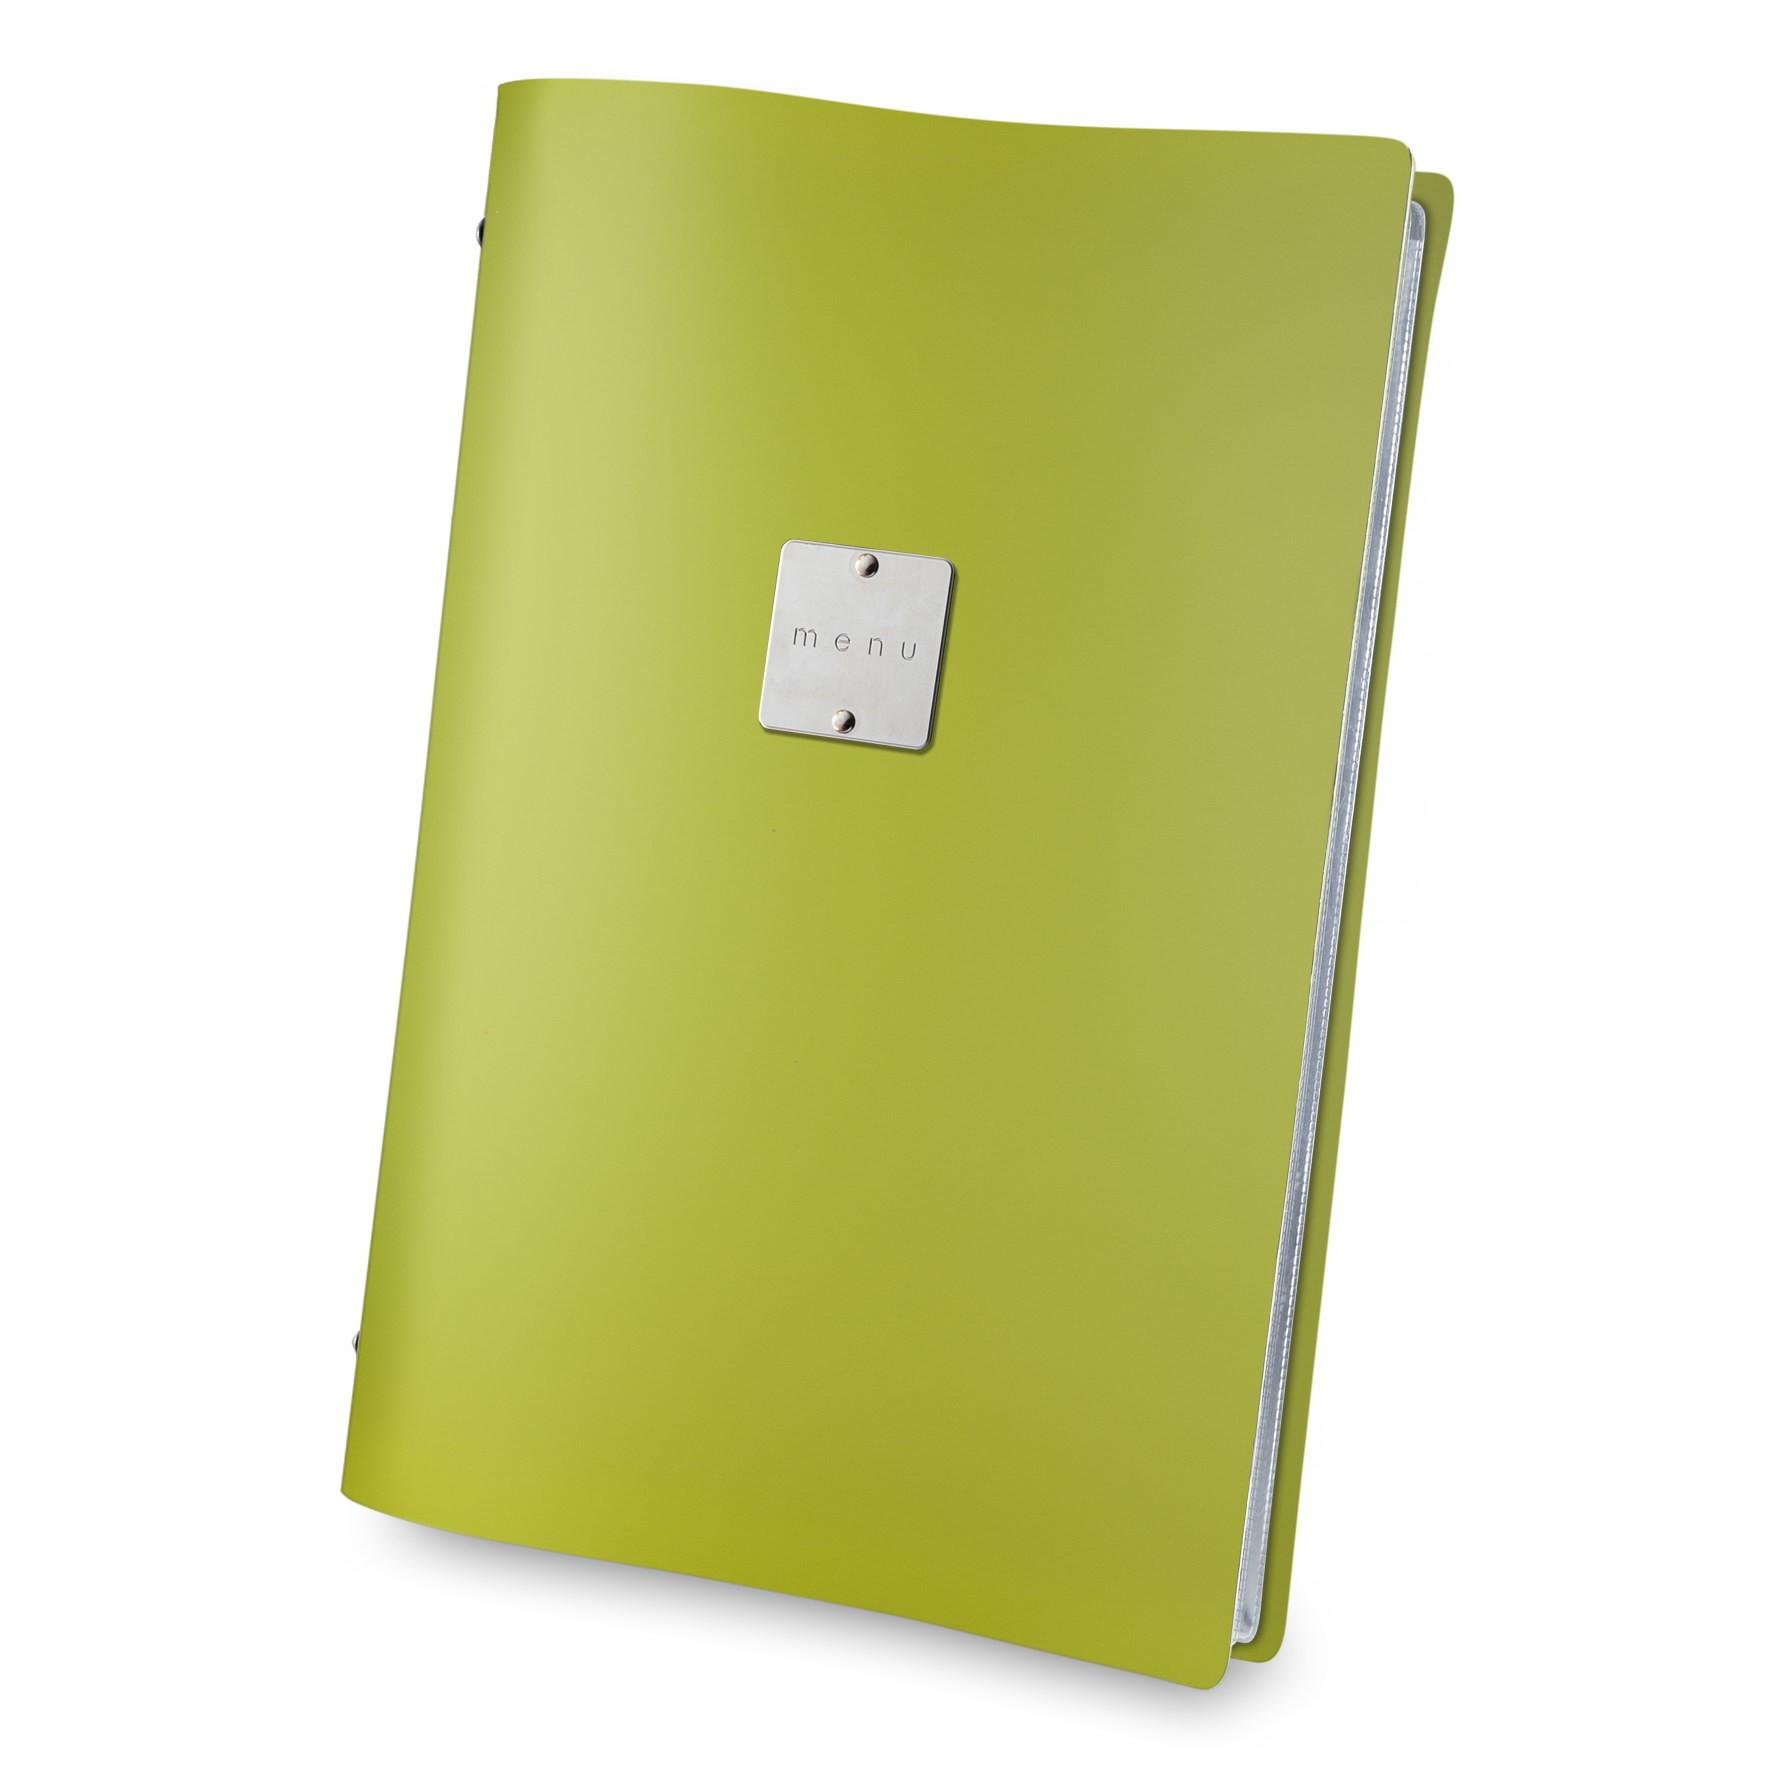 Protège-menu Fashion citron vert